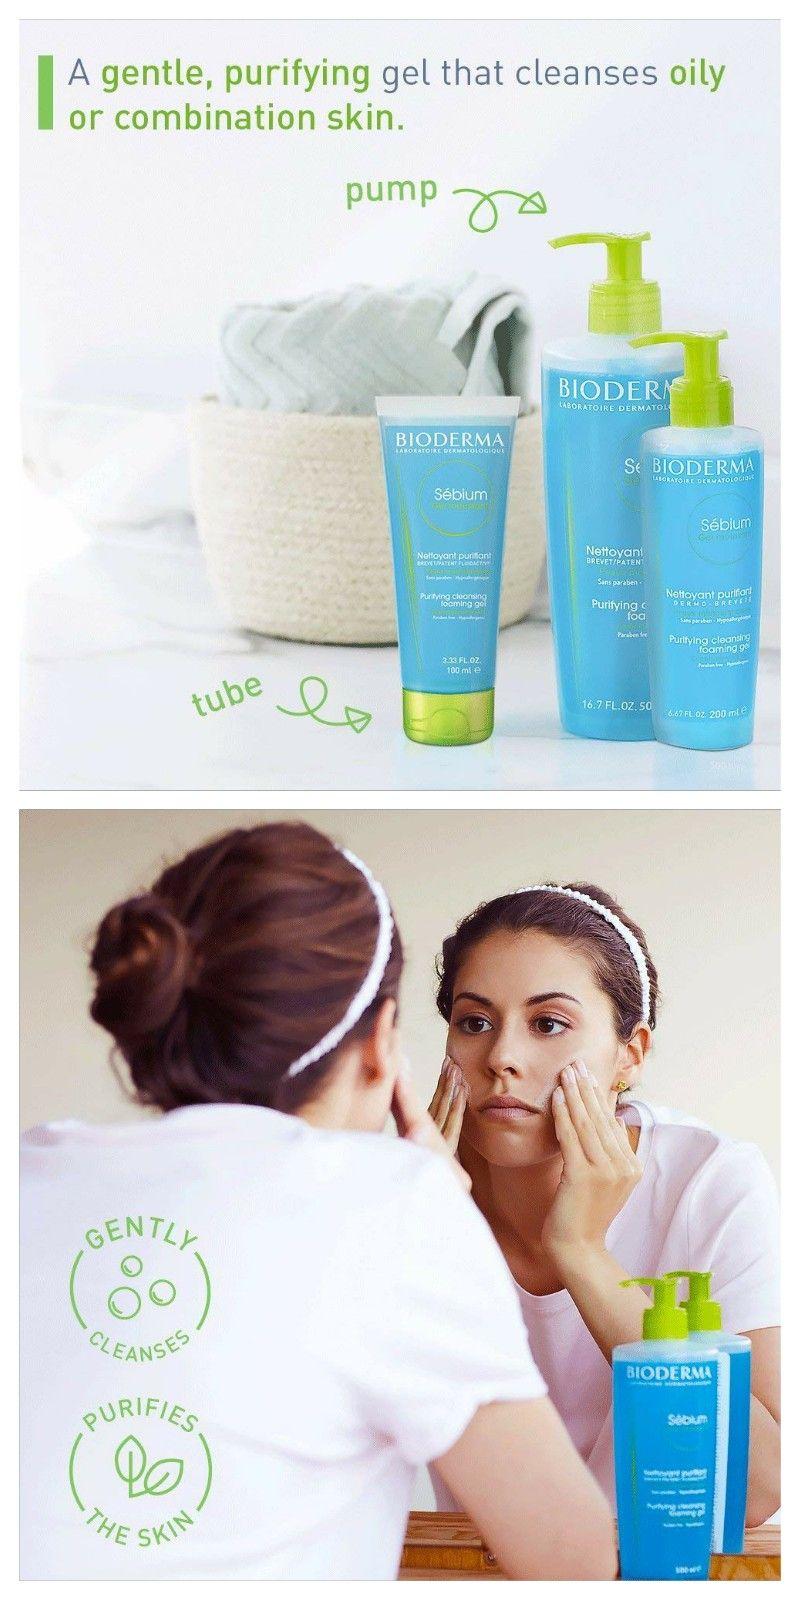 Bioderma Sebium Foaming Gel Facial Cleanser For Combination To